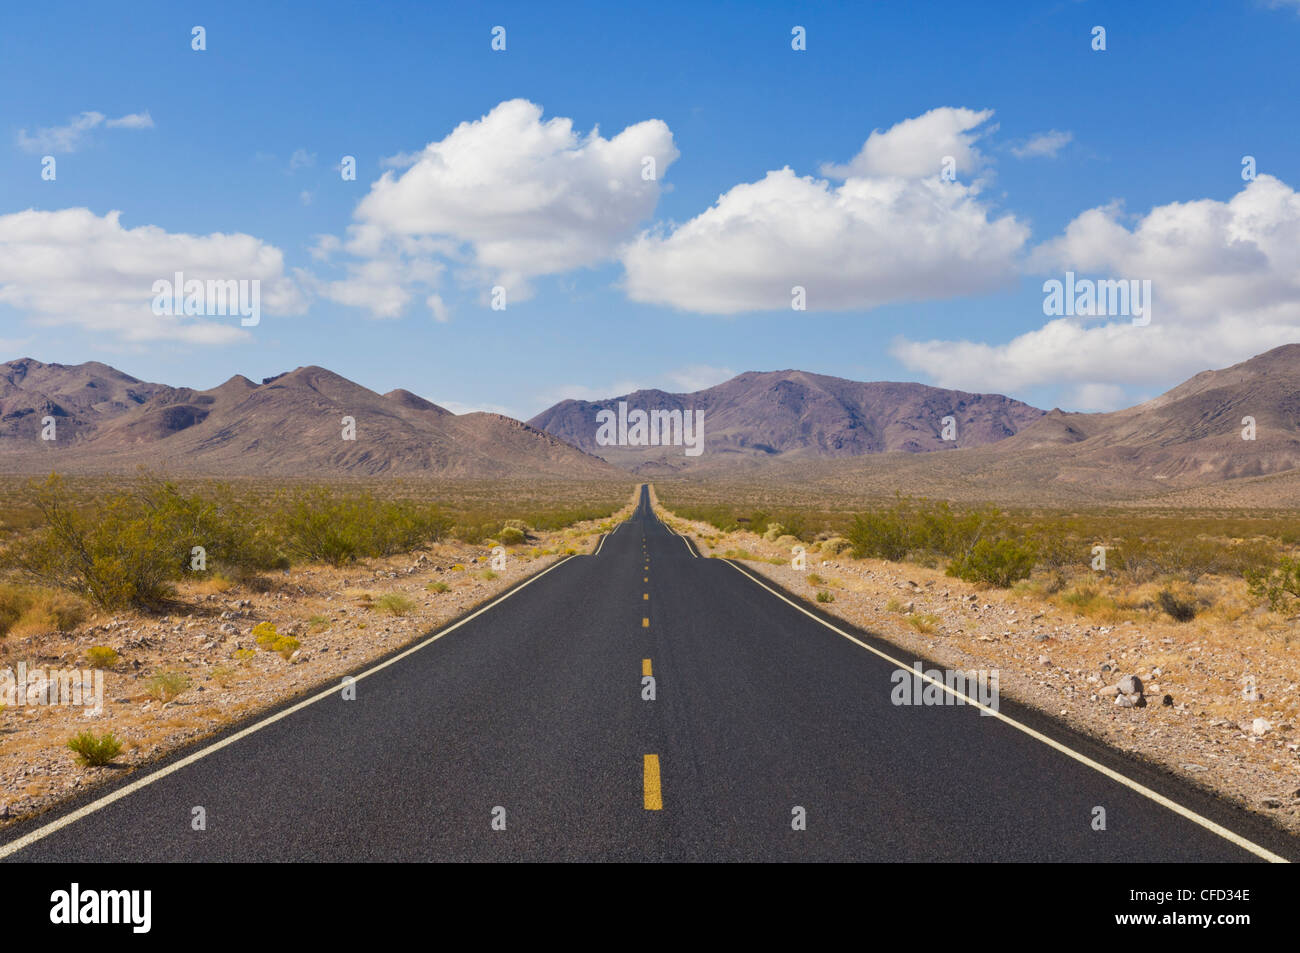 Daylight Pass road, Highway 374 from Beatty Nevada, Death Valley National Park, California Nevada border, USA - Stock Image